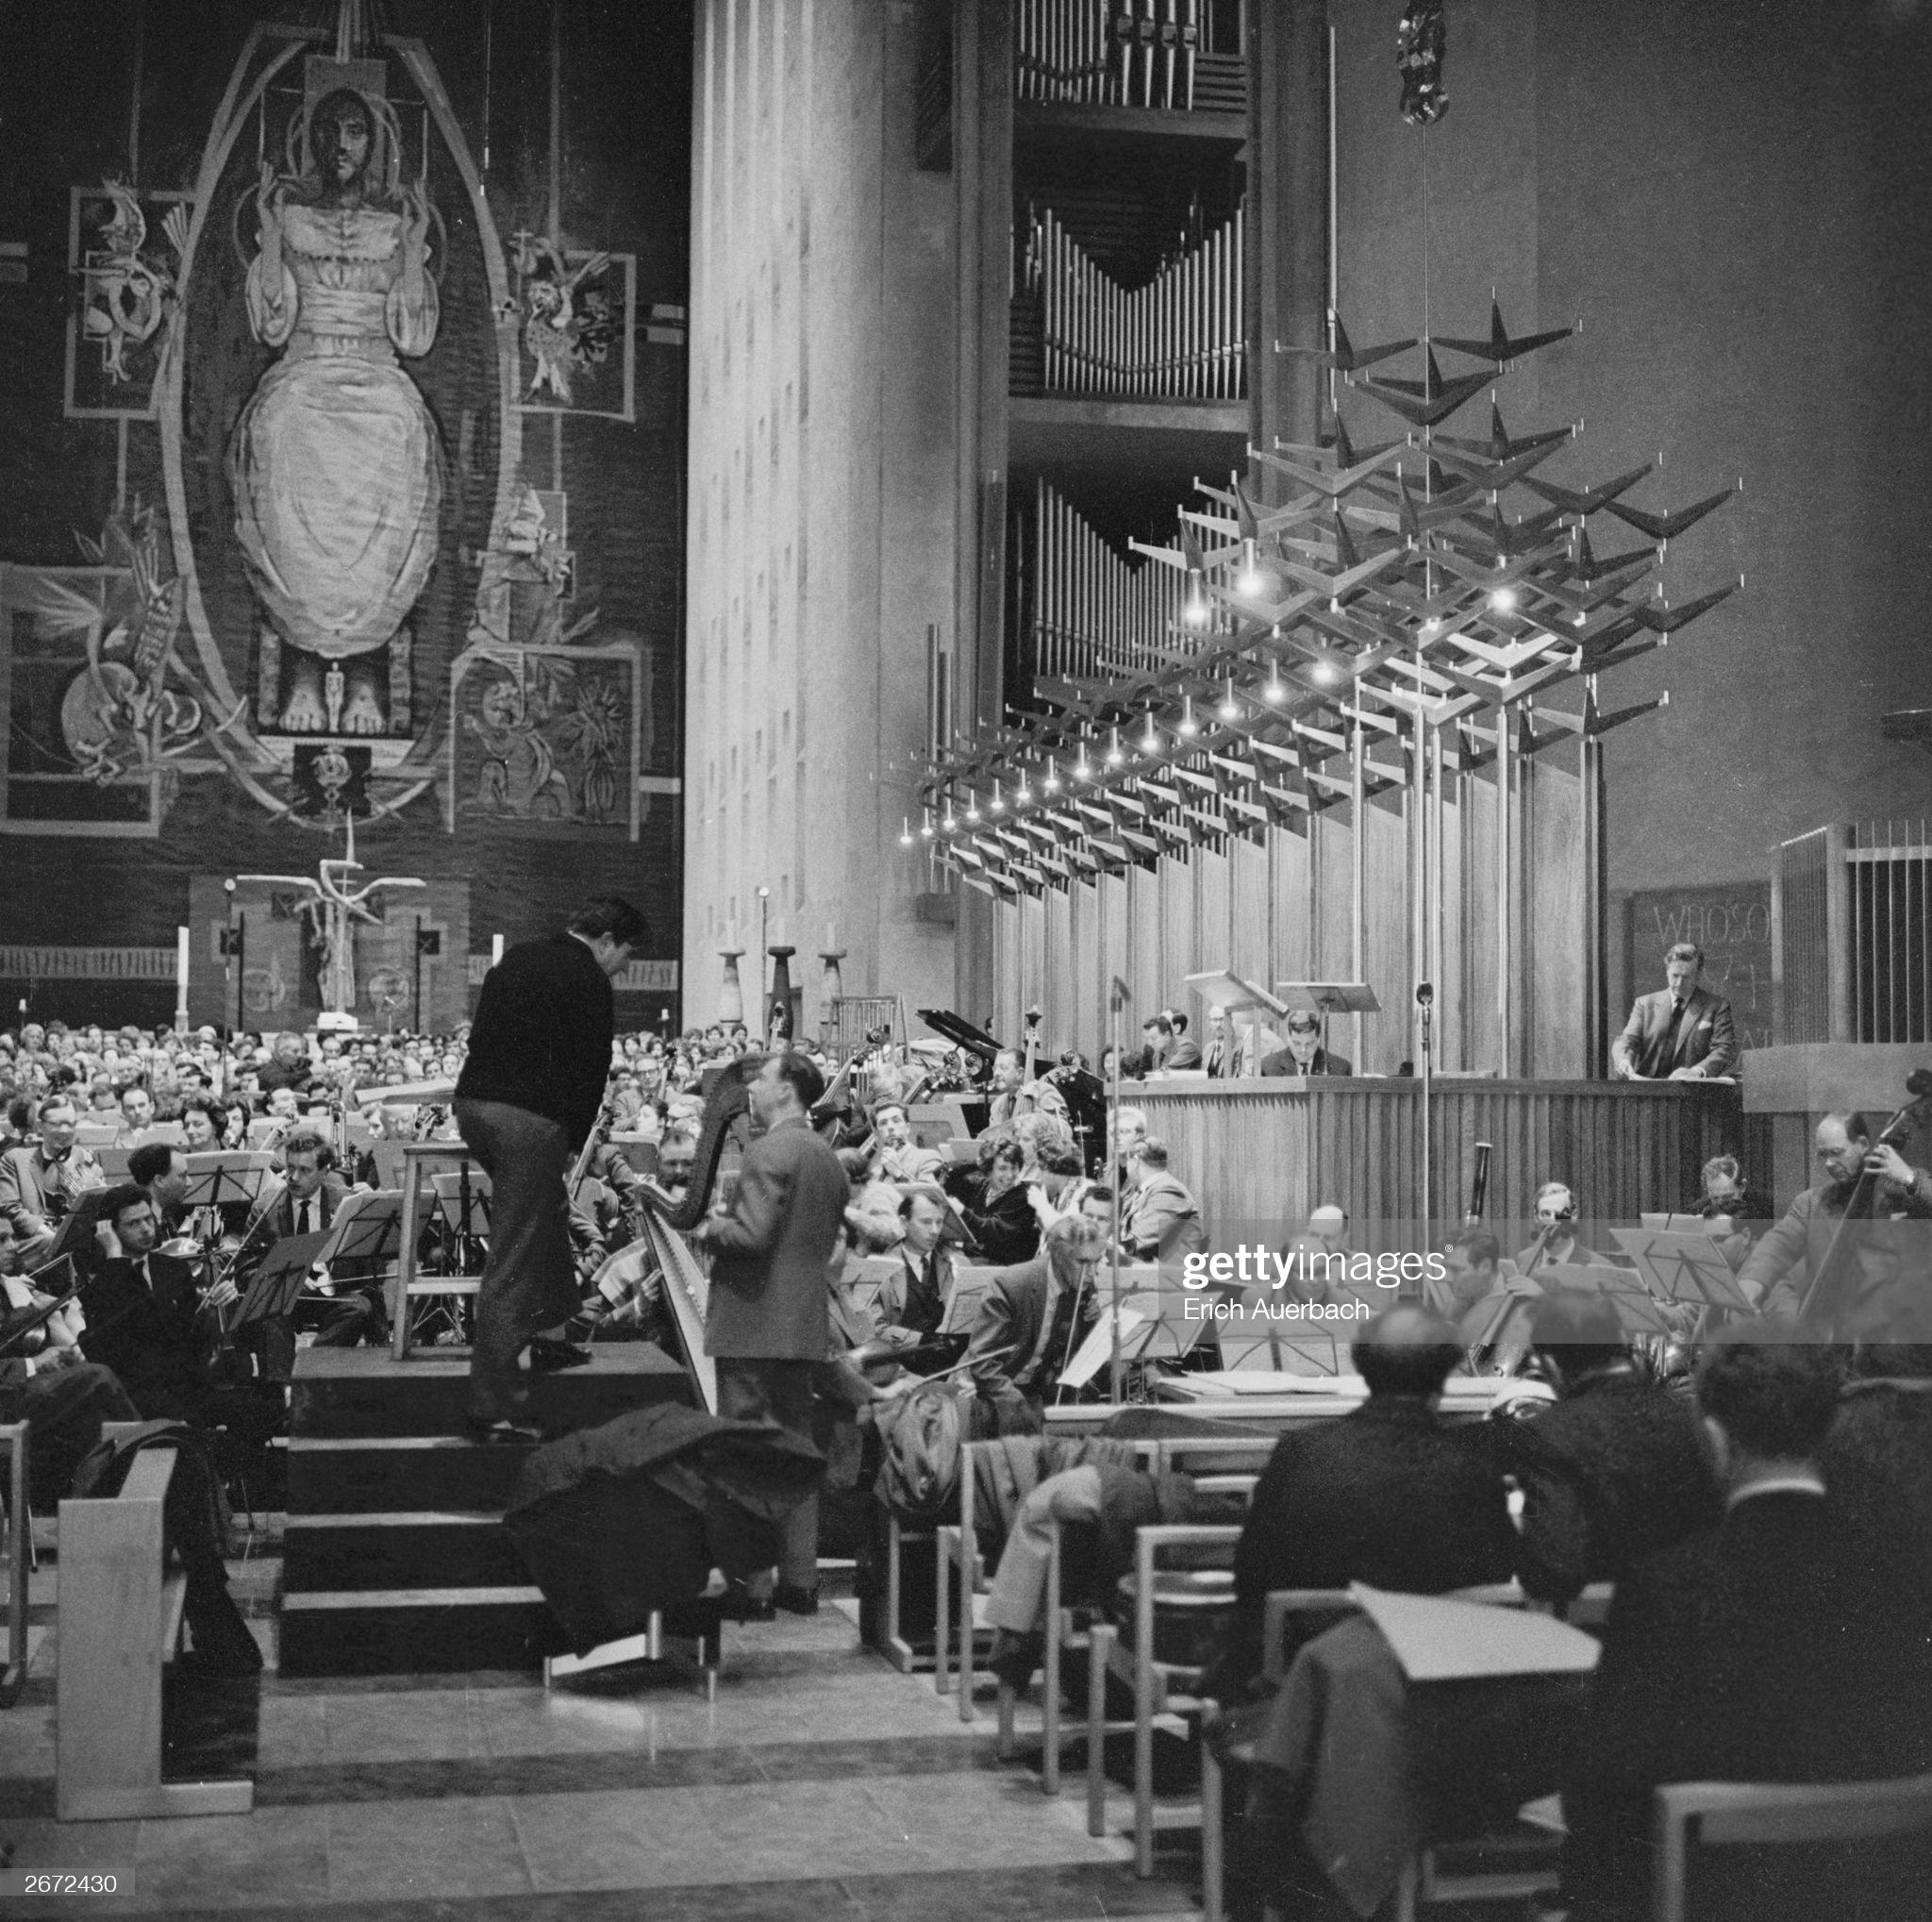 Репетиция Военного реквиема. 1962 год  © Photo by Erich Auerbach/Getty Images